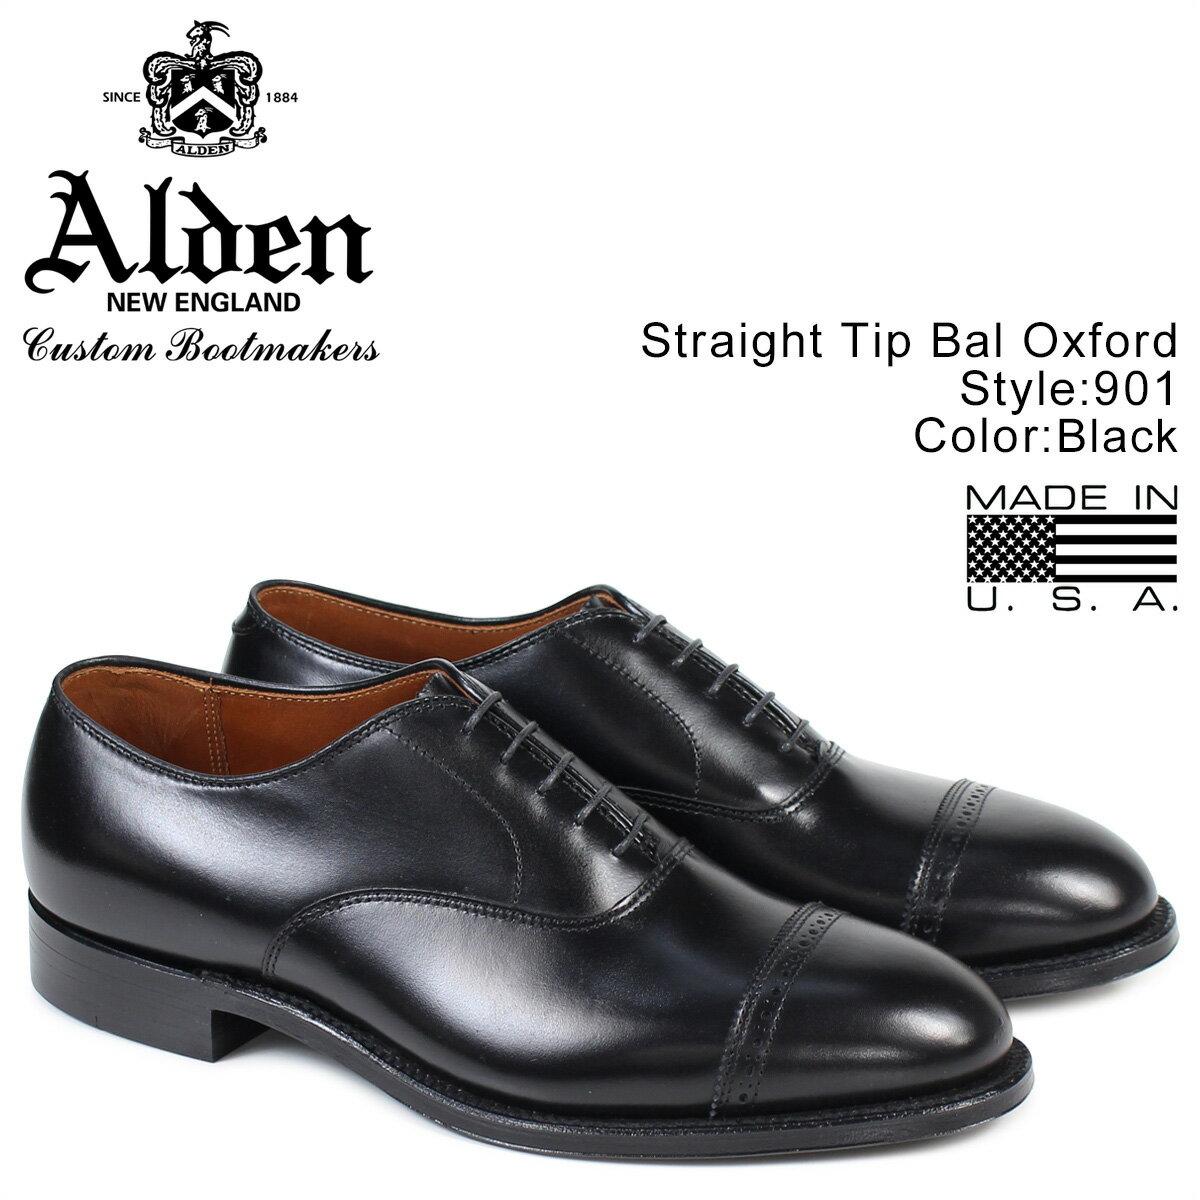 ALDEN オールデン ストレートチップ シューズ STRAIGHT TIP BAL OXFORD Dワイズ 901 メンズ